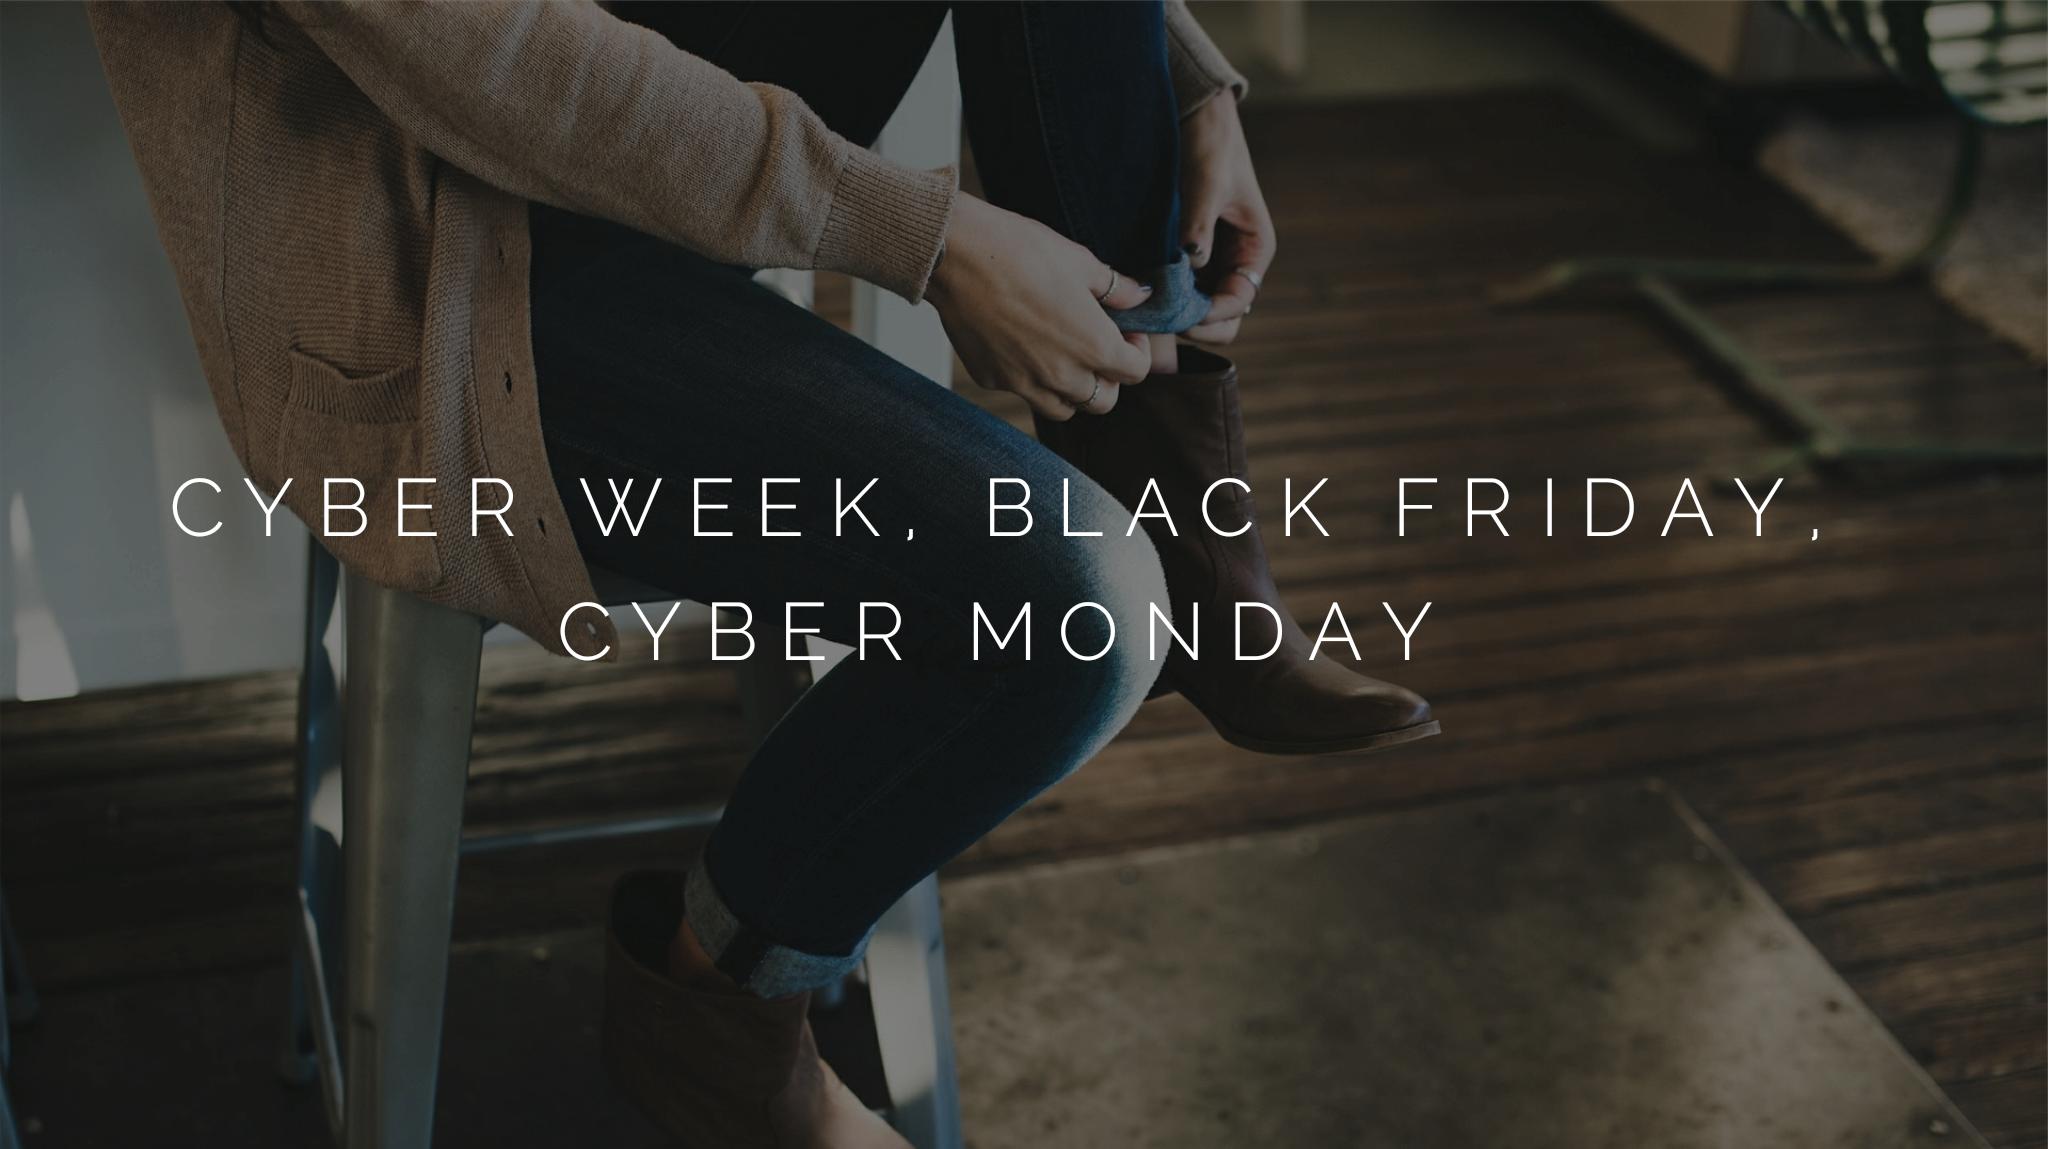 Black Friday Angebote 2018: Die besten Rabatte & Codes im Überblick